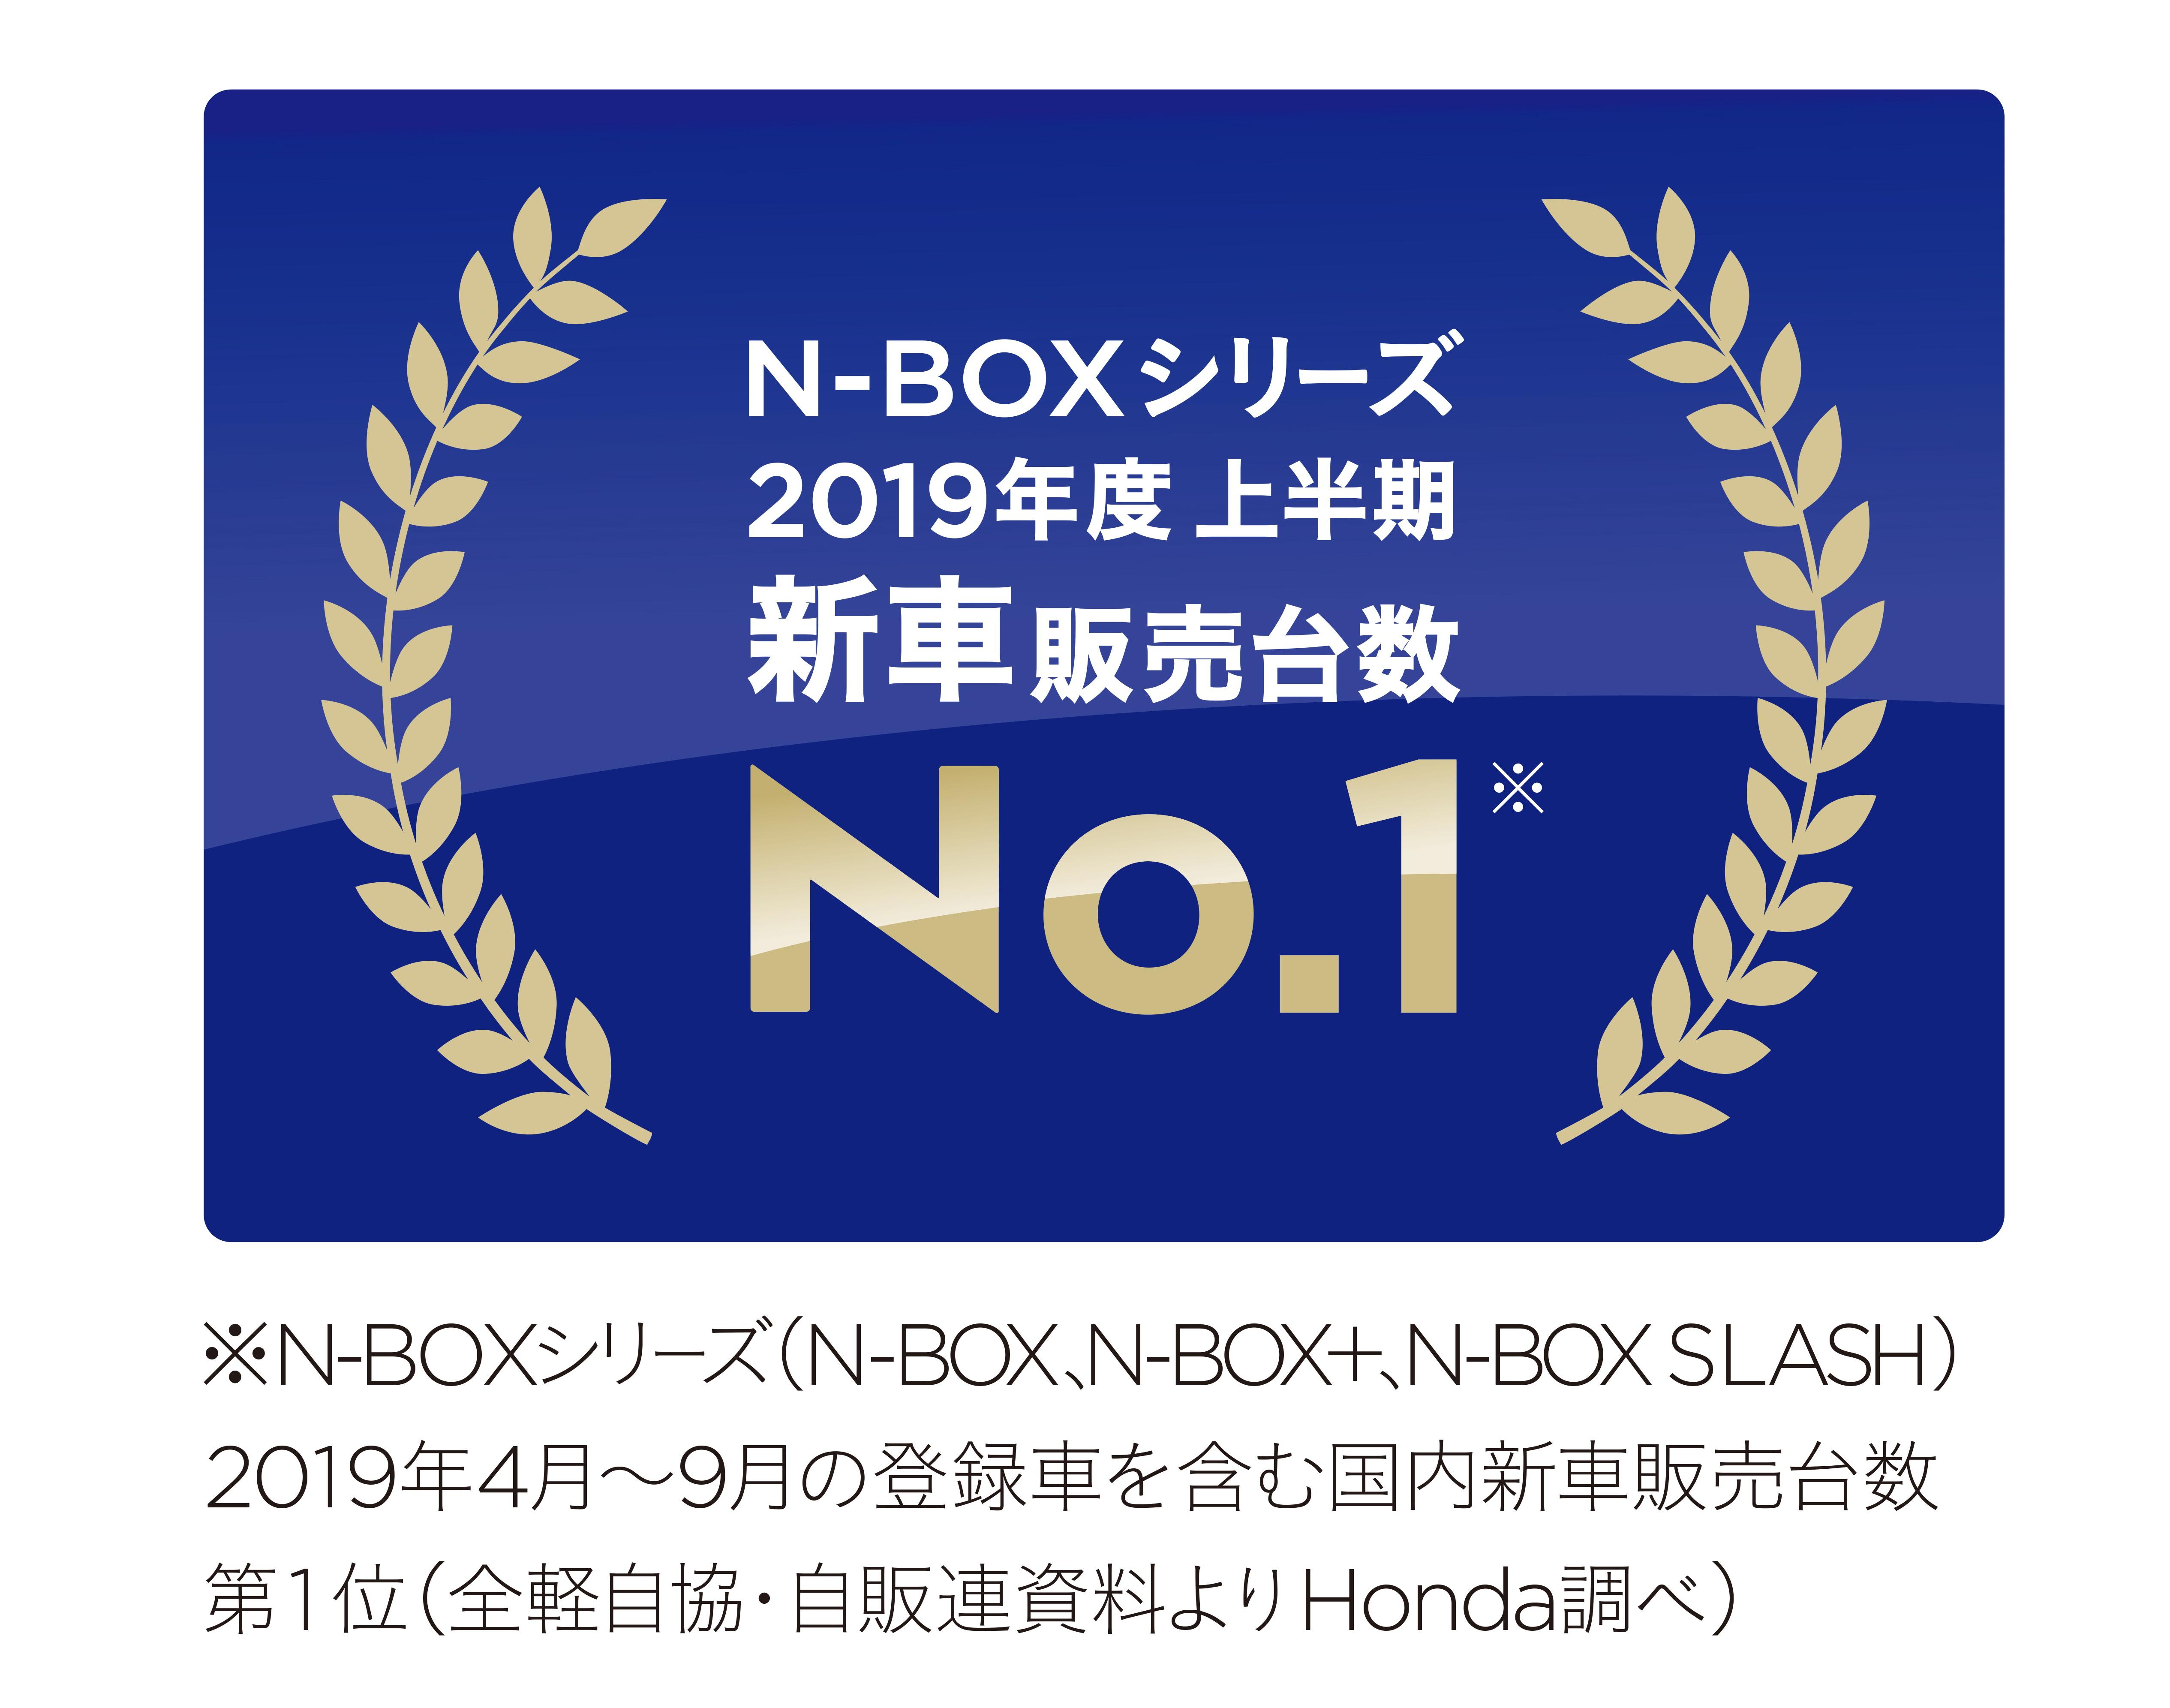 「N-BOX」シリーズが2019年度上半期 新車販売台数 第1位を獲得